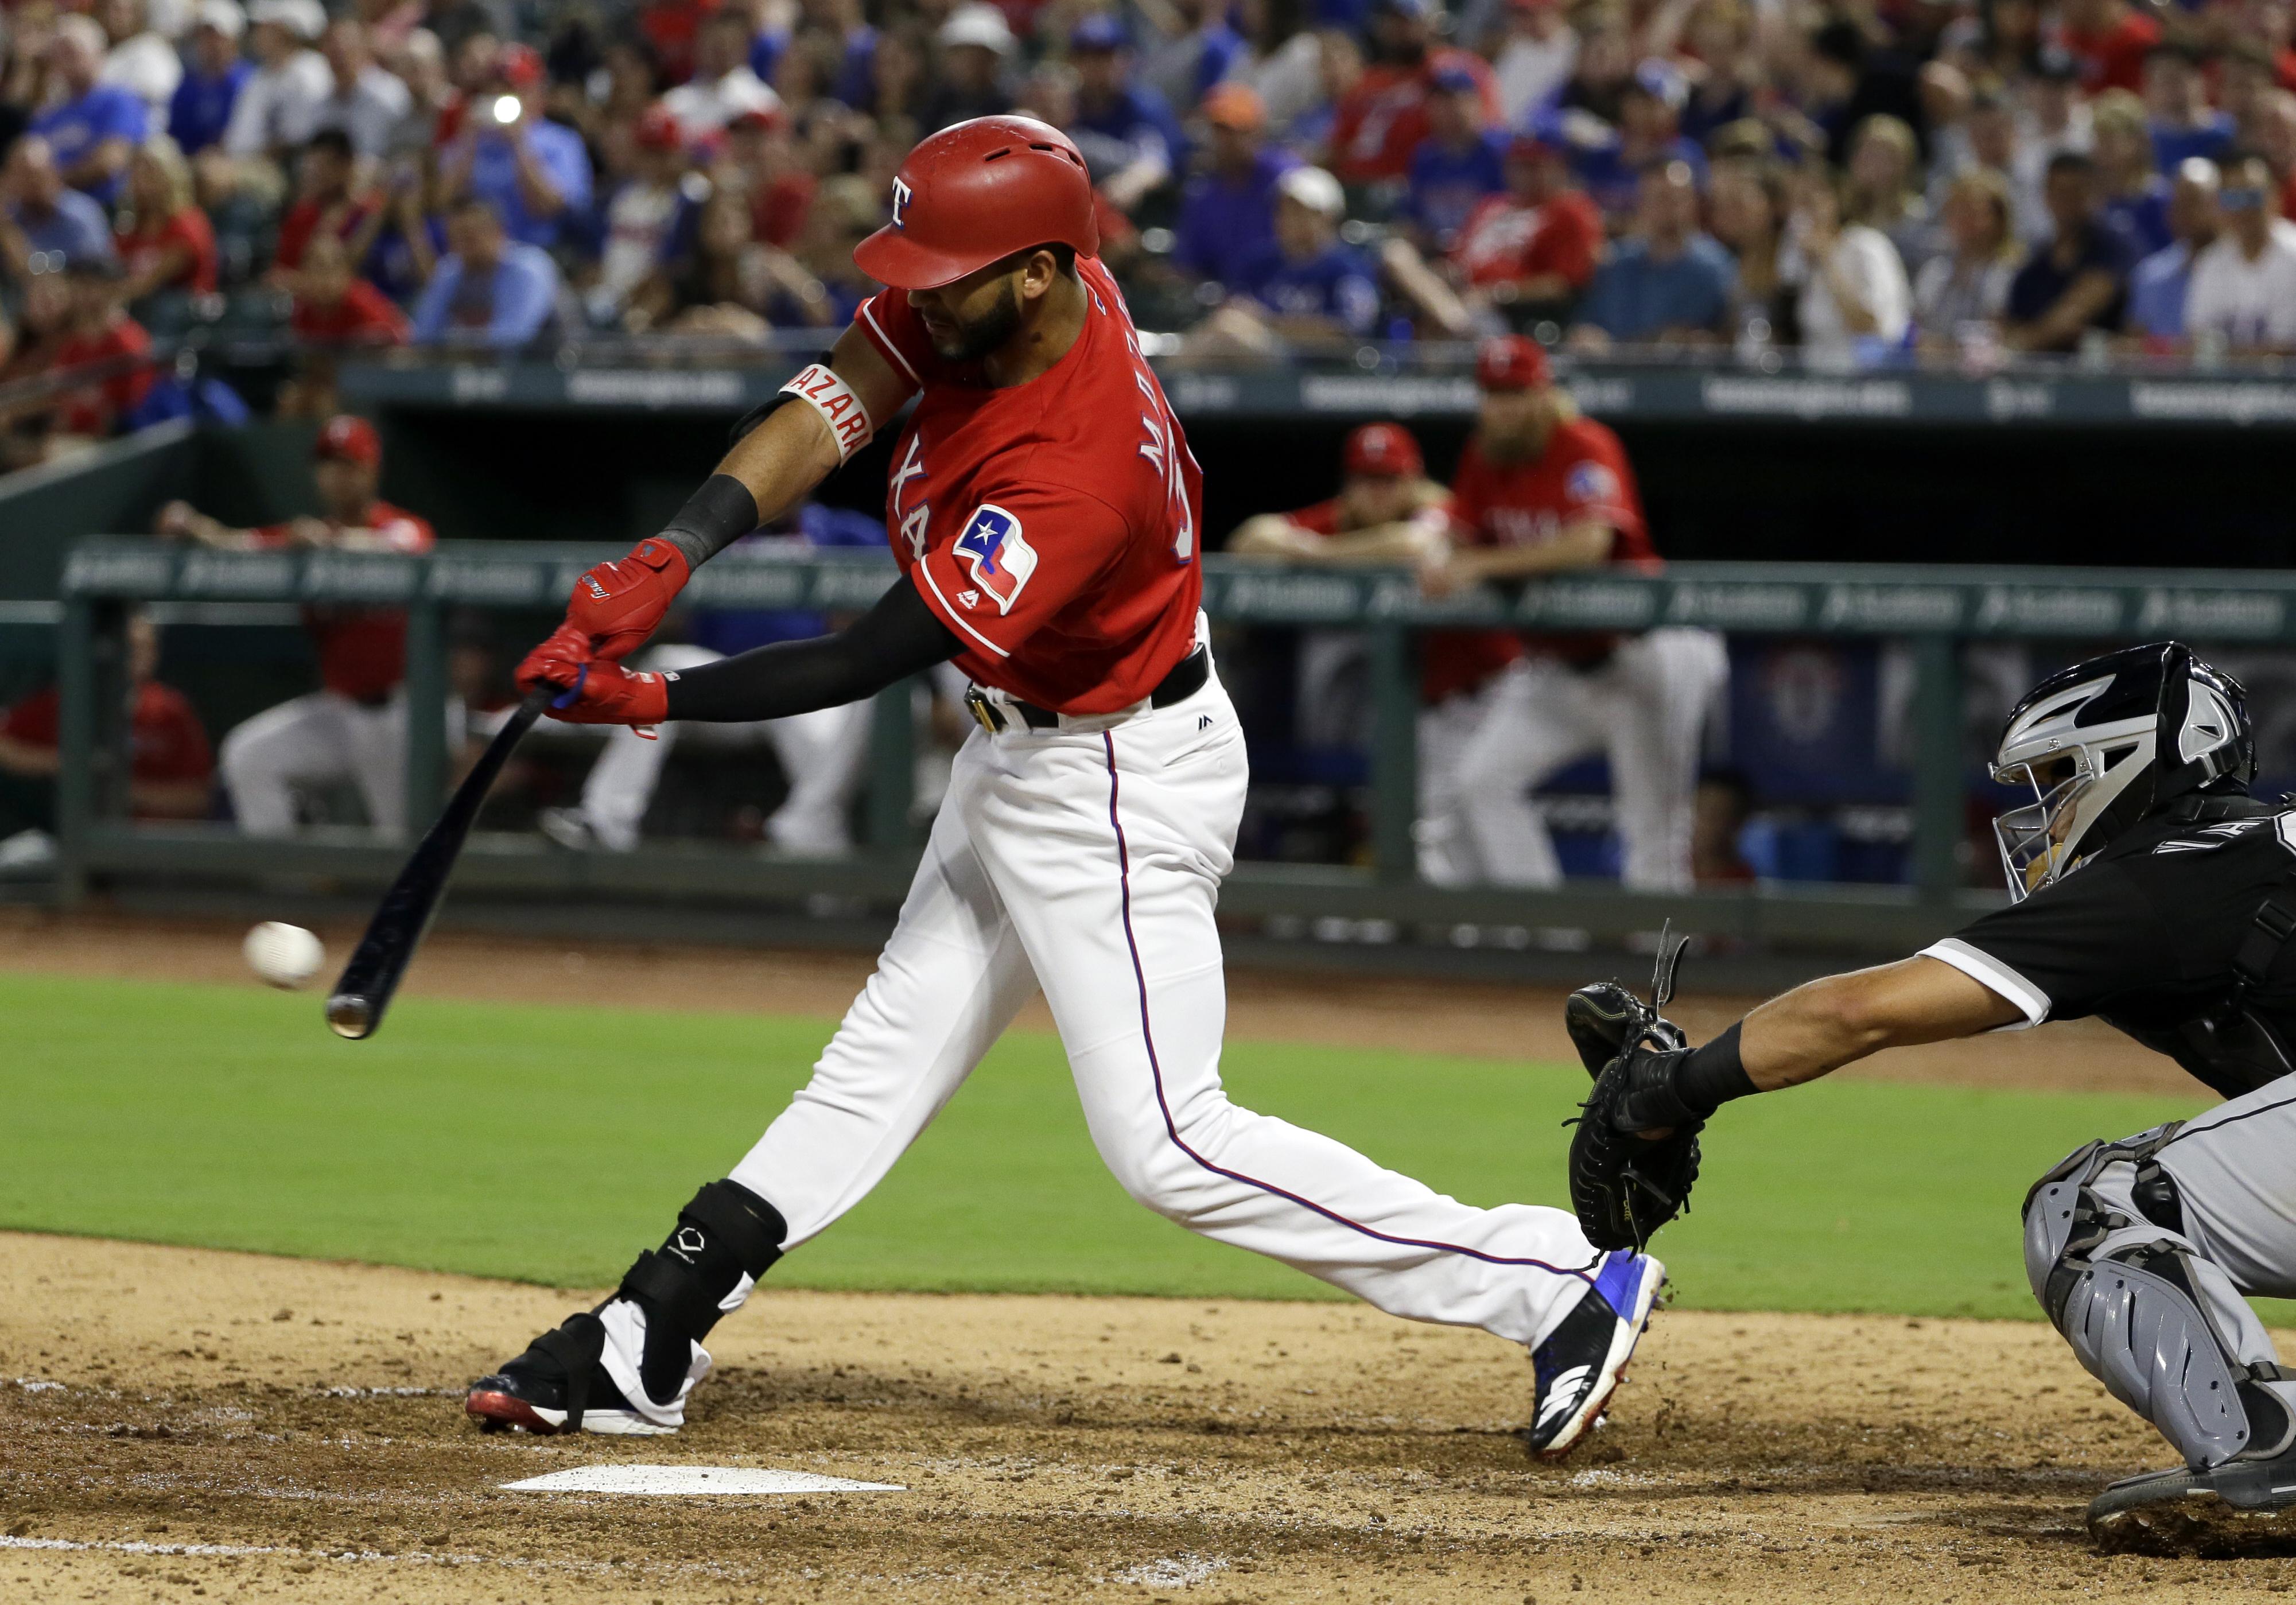 Texas Rangers' Nomar Mazara connects for a two-run single against the White Sox in 2017, in Arlington, Texas. (AP)